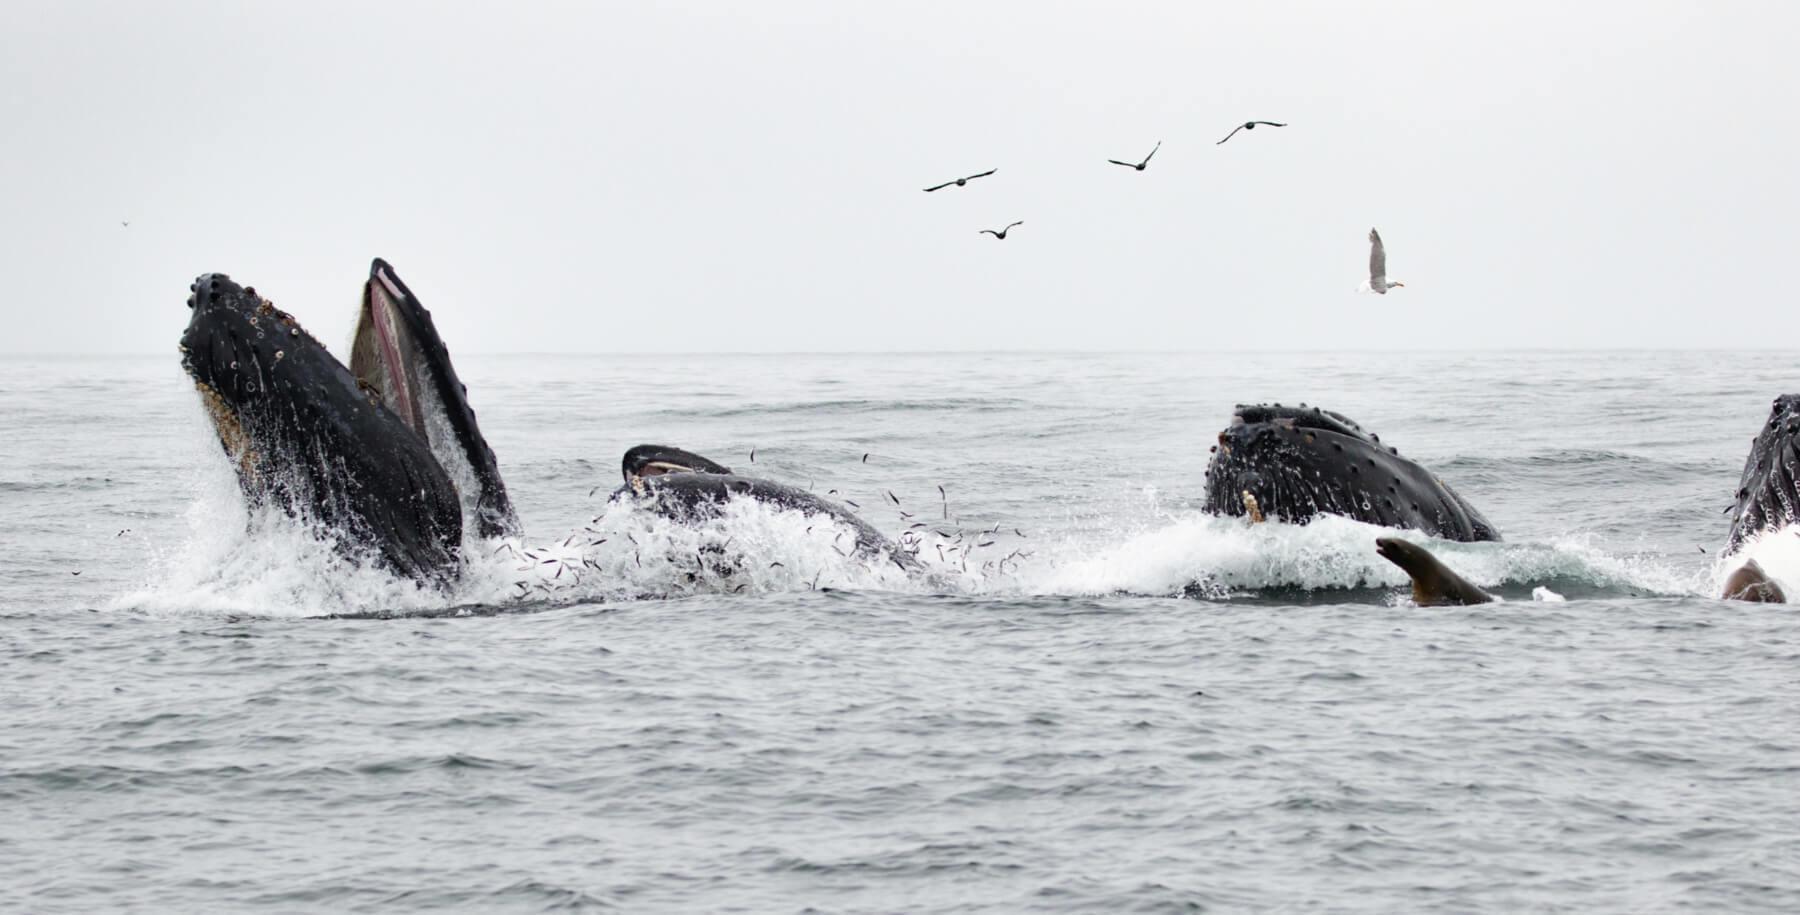 A spectacular humpback feeding frenzy on August 24. © Chris Biertuempfel